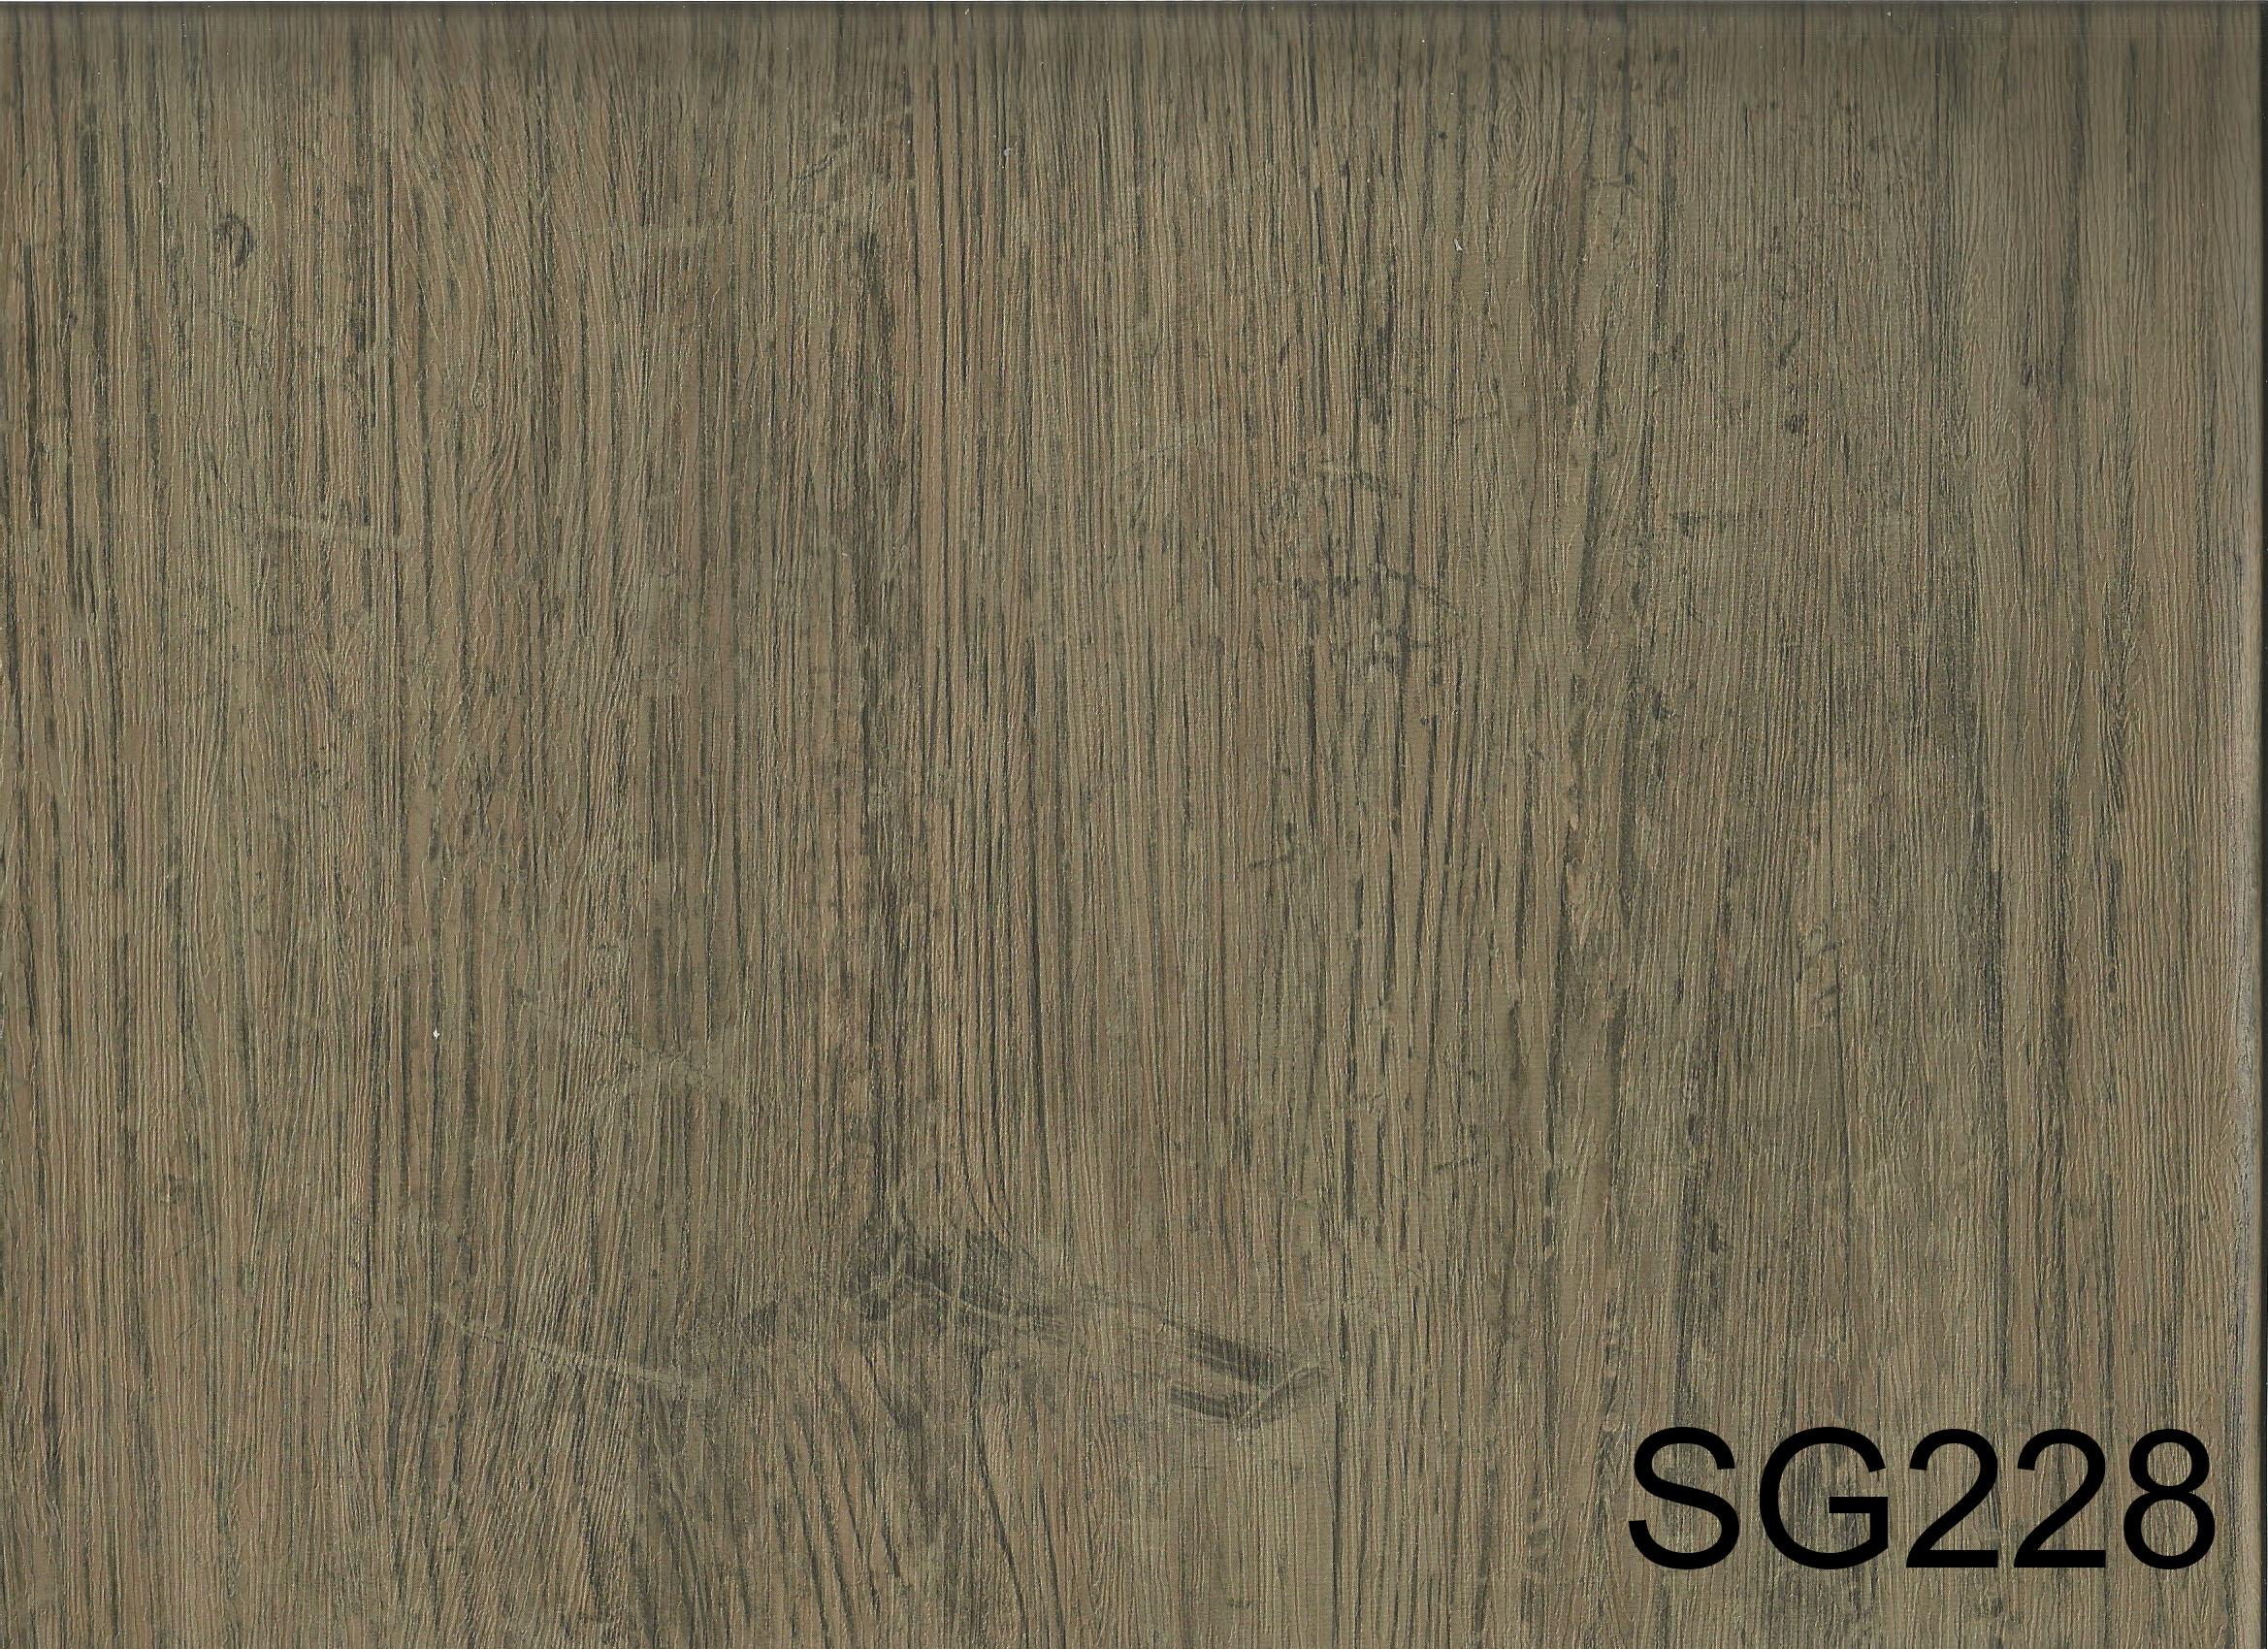 SG228